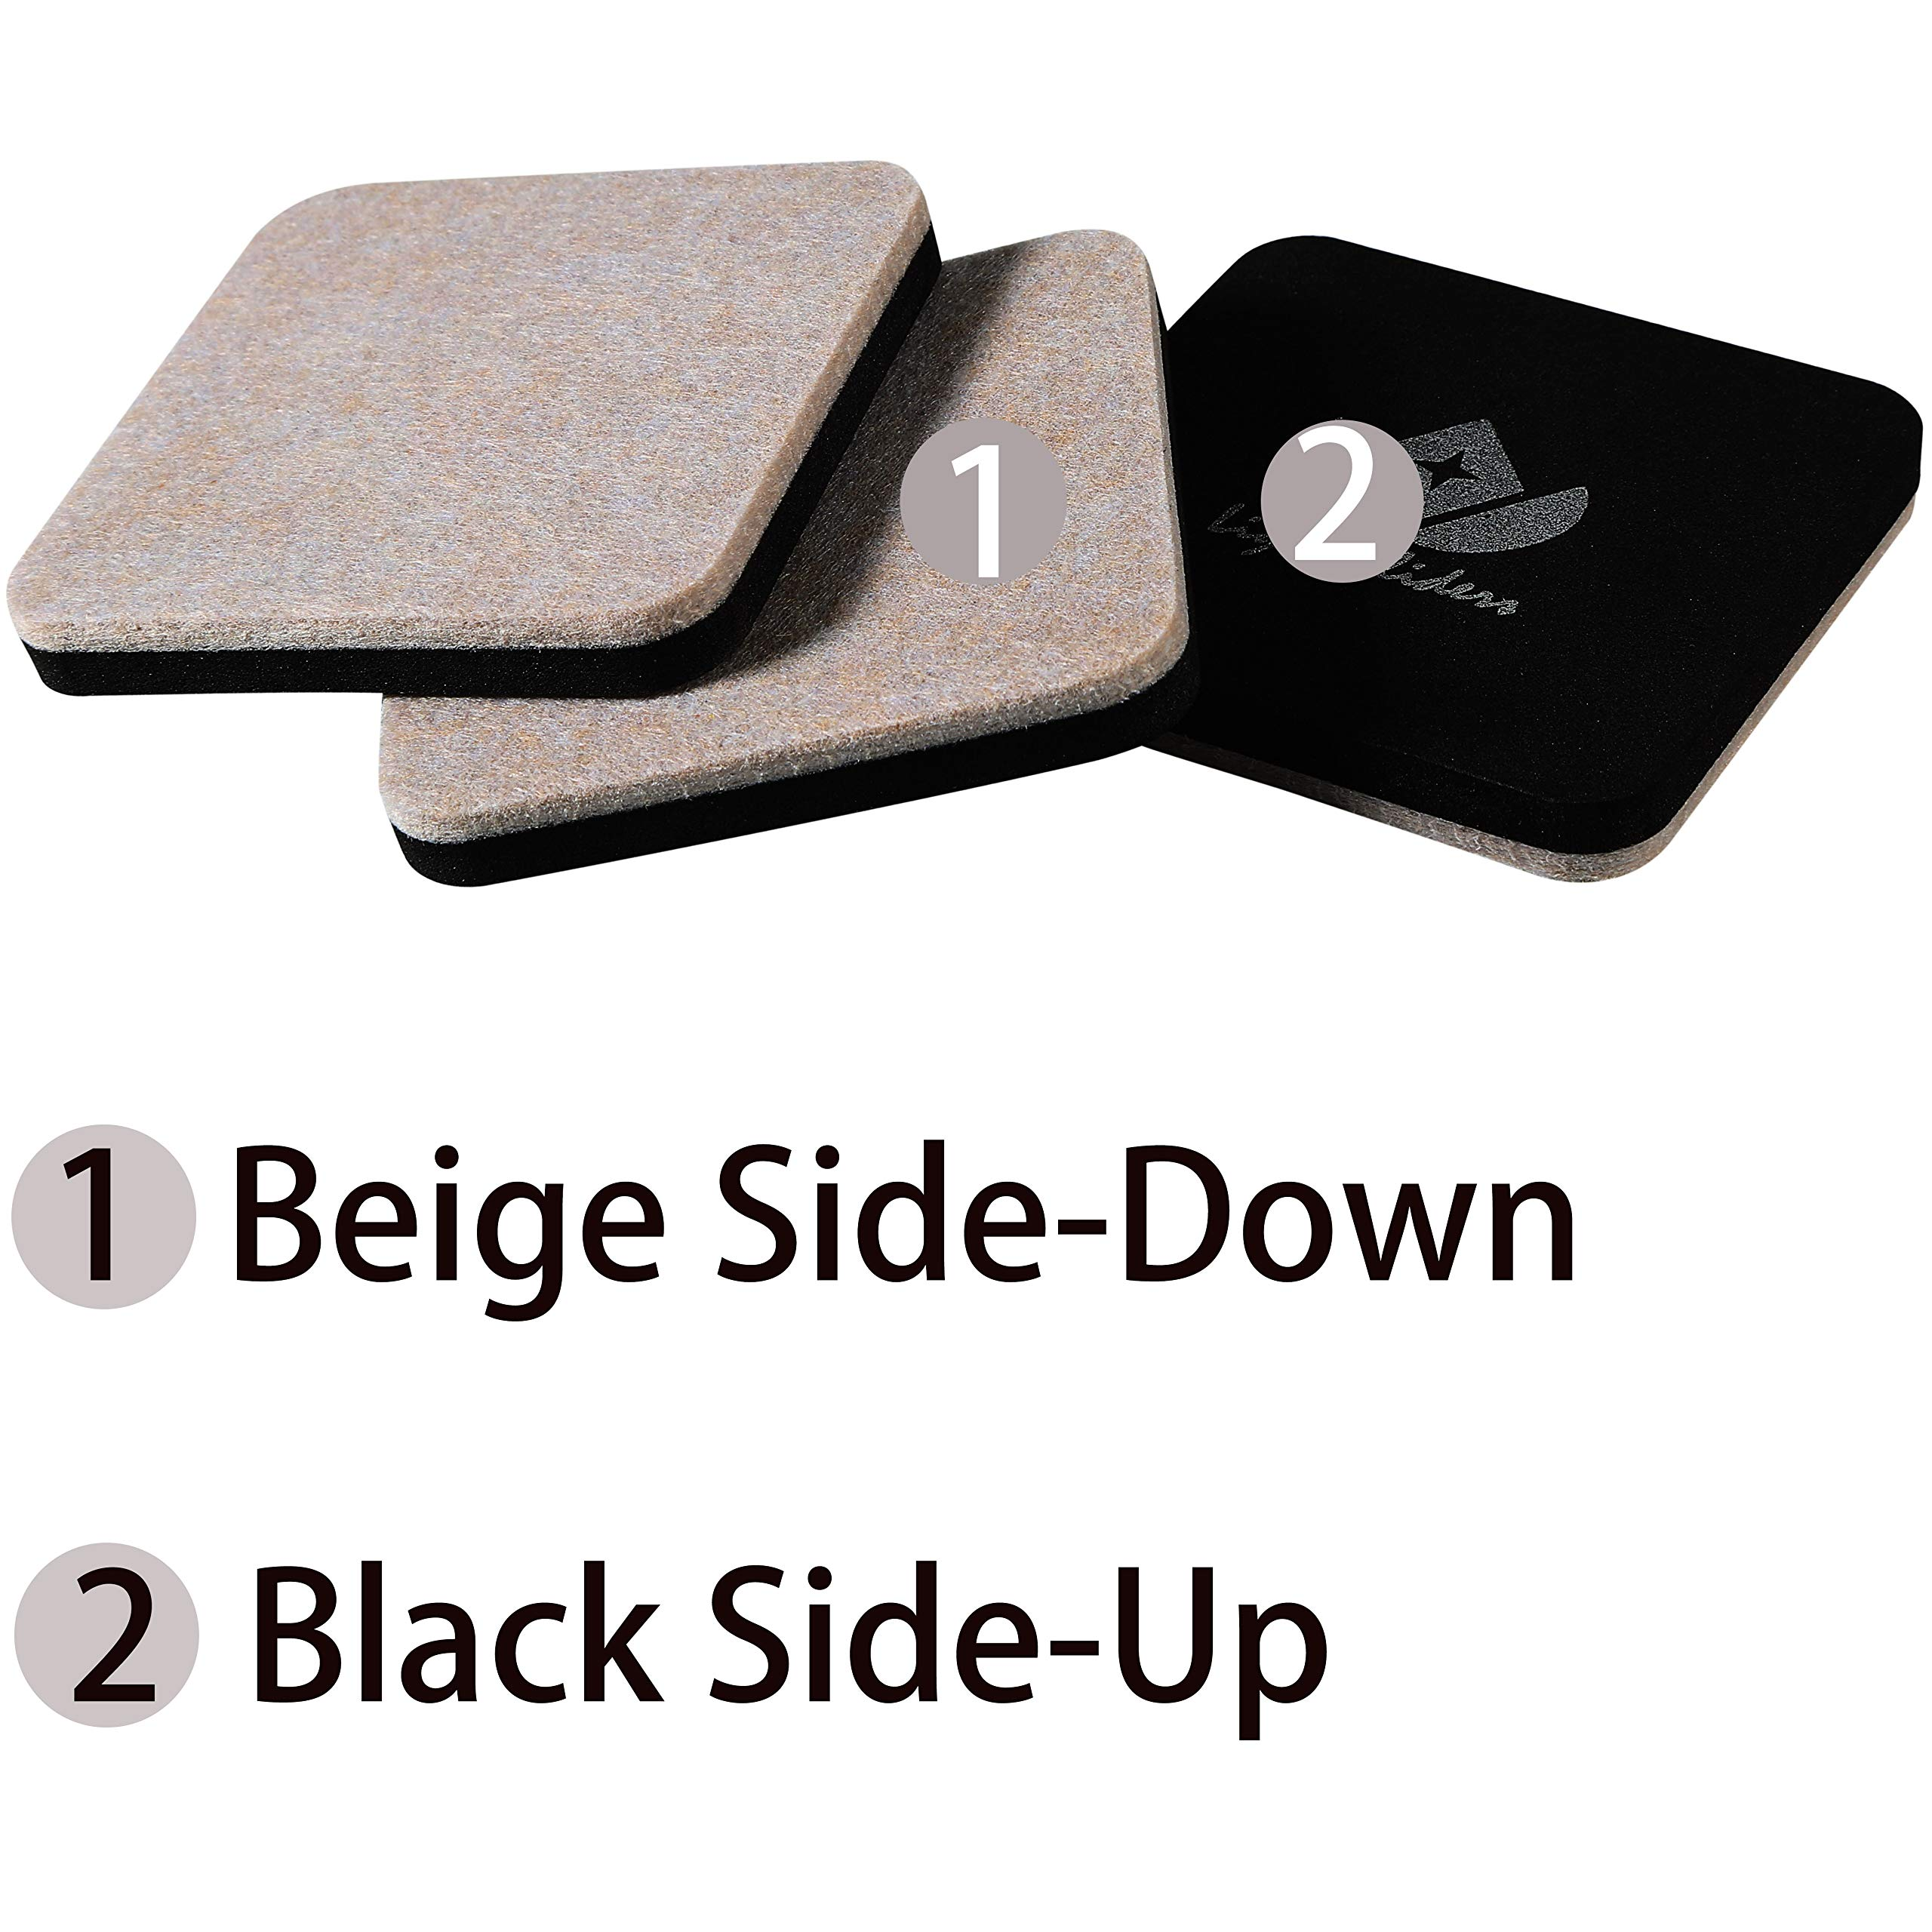 Liyic 20 Pack 3in.Square Felt Sliders for Hard Surfaces-Felt Furniture Sliders - Heavy Duty Sliders – Reusable Hardwood Floor Sliders -Furniture Moving Sliders-Sofa Sliders Gliders Glides Movers by Liyic (Image #3)